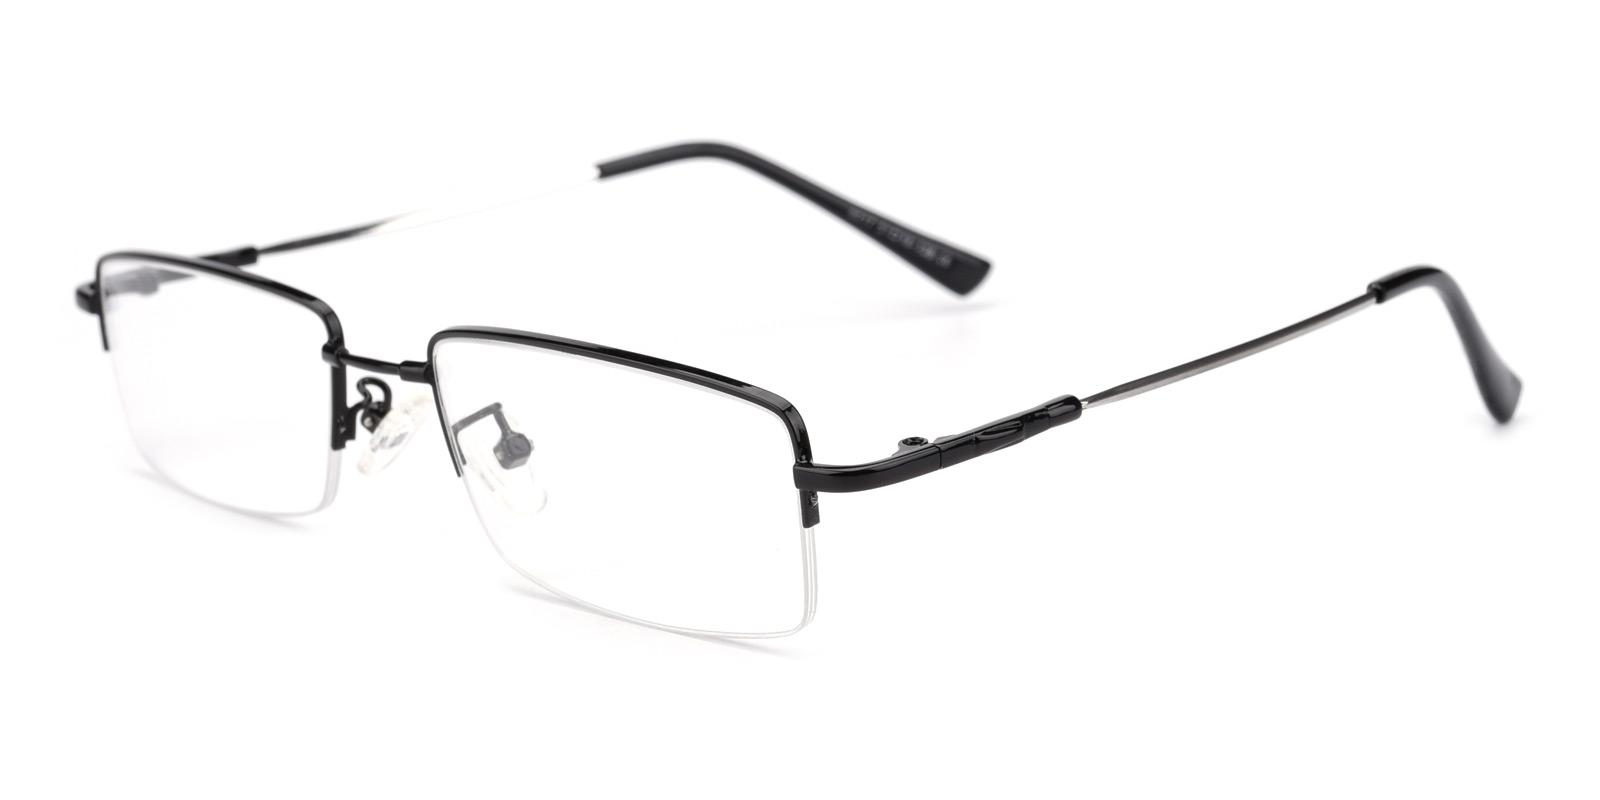 Pluto-Black-Rectangle-Metal-Eyeglasses-detail